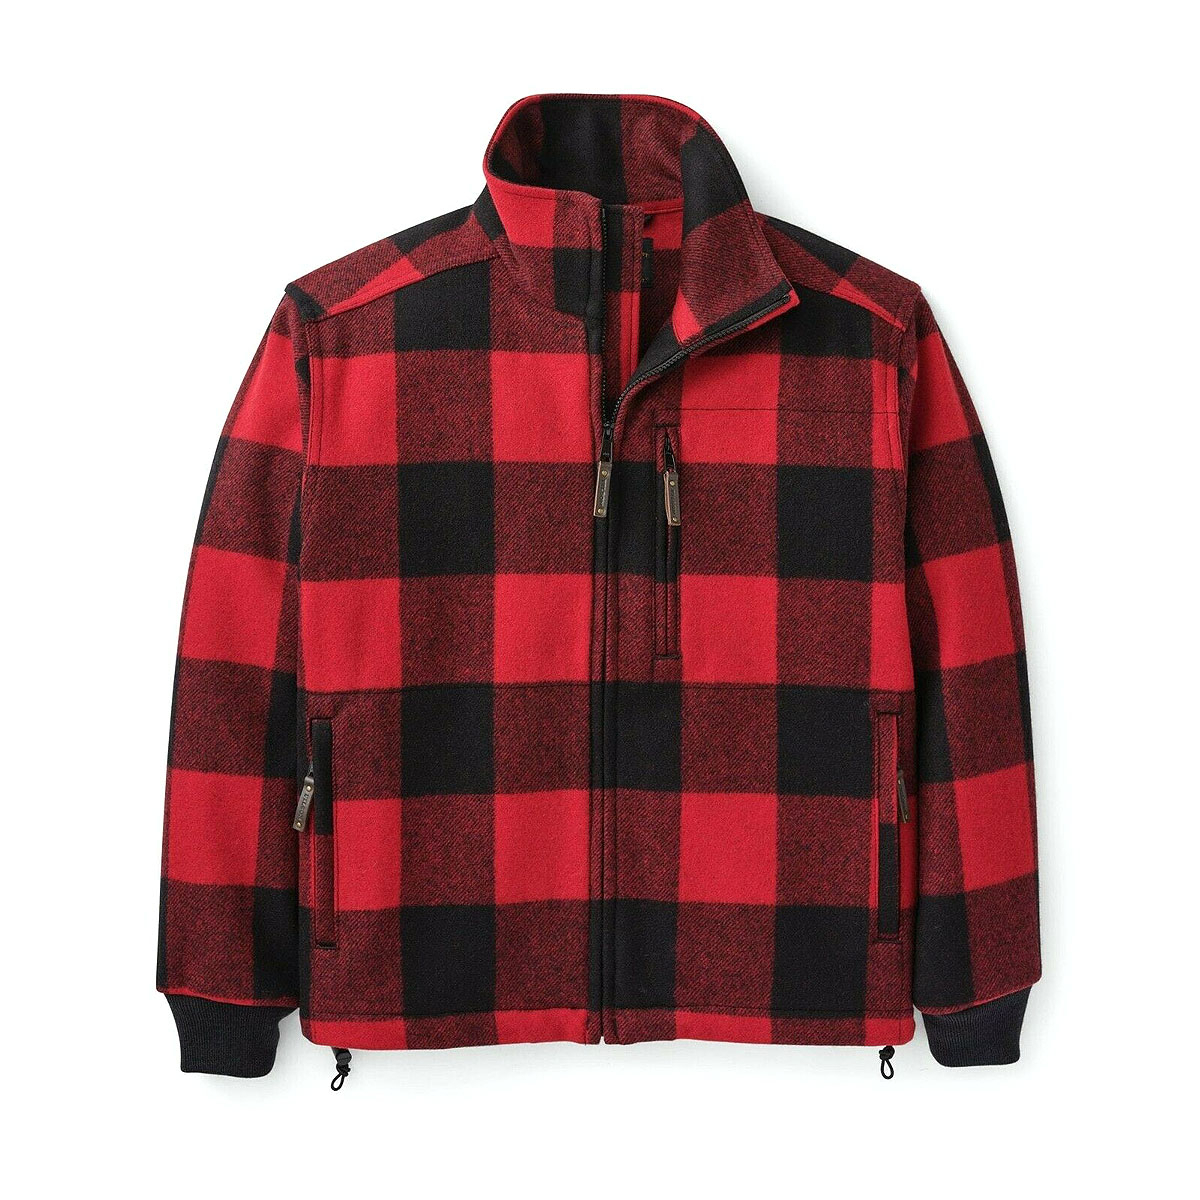 Filson Mackinaw Wool Field Jacket Red Black